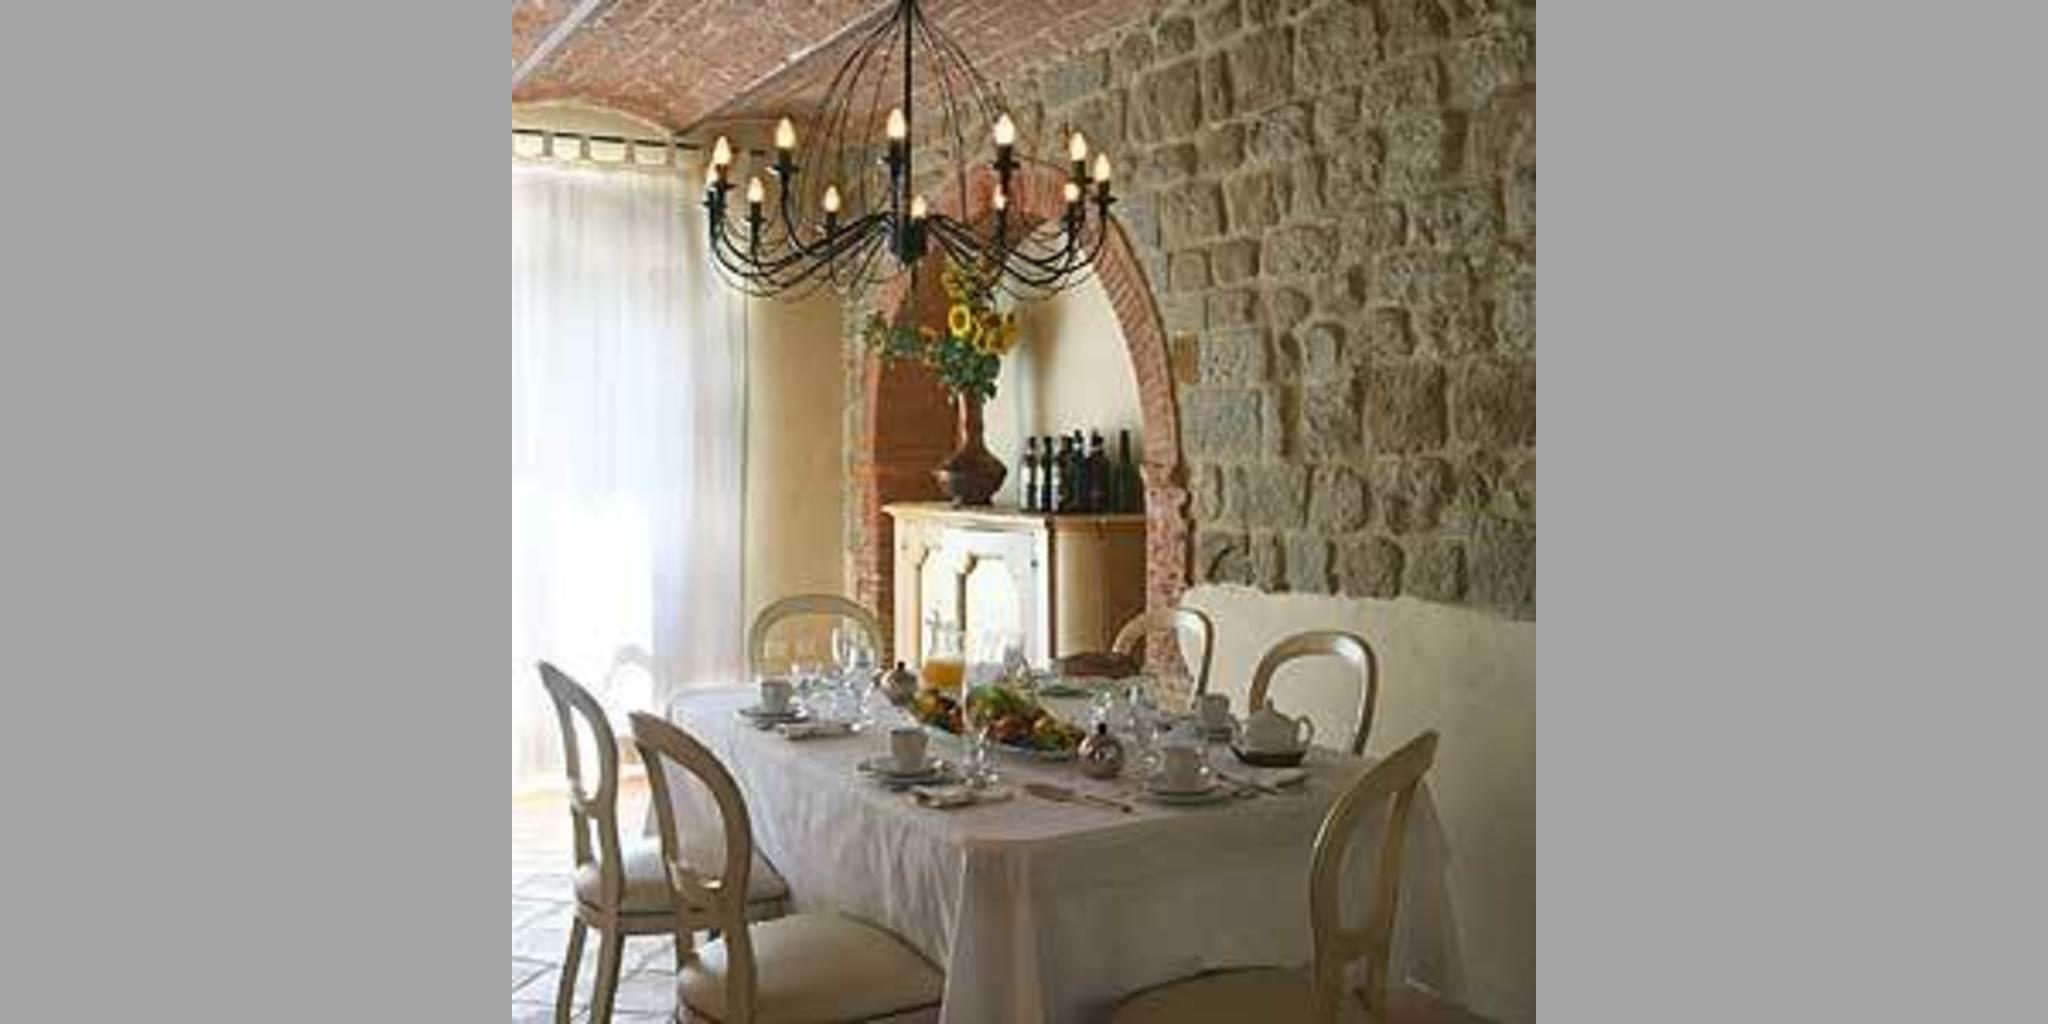 Bed & Breakfast Anghiari - Località San Lorenzo